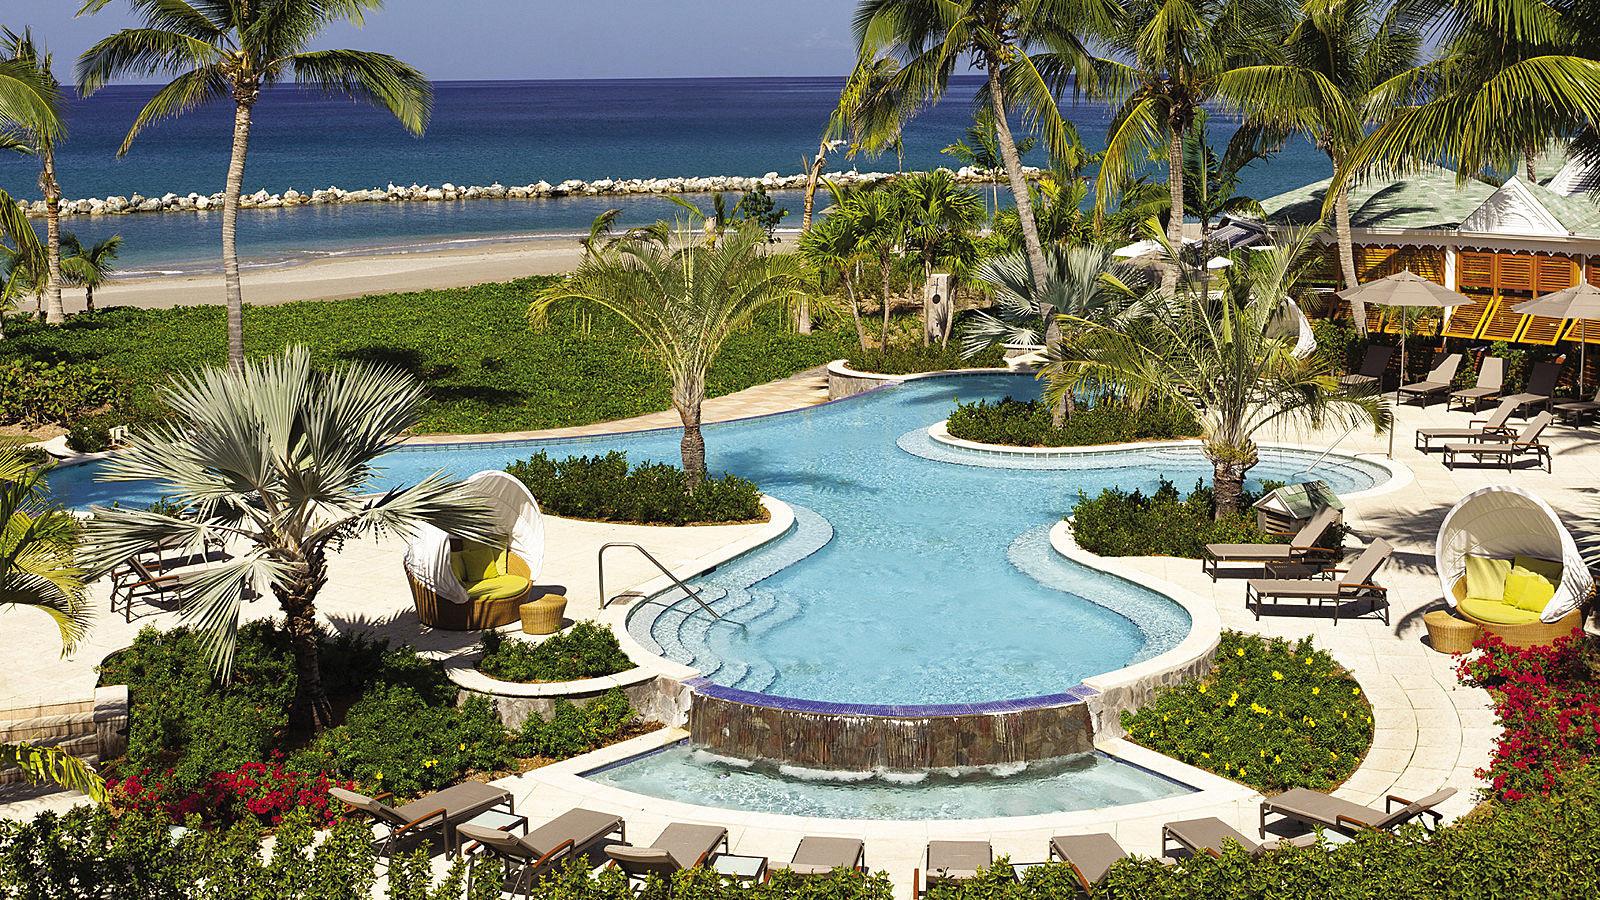 Hotel Nevis Wellness And Spa Four Seasons Resort Nevis Named Best Caribbean Tennis Resort